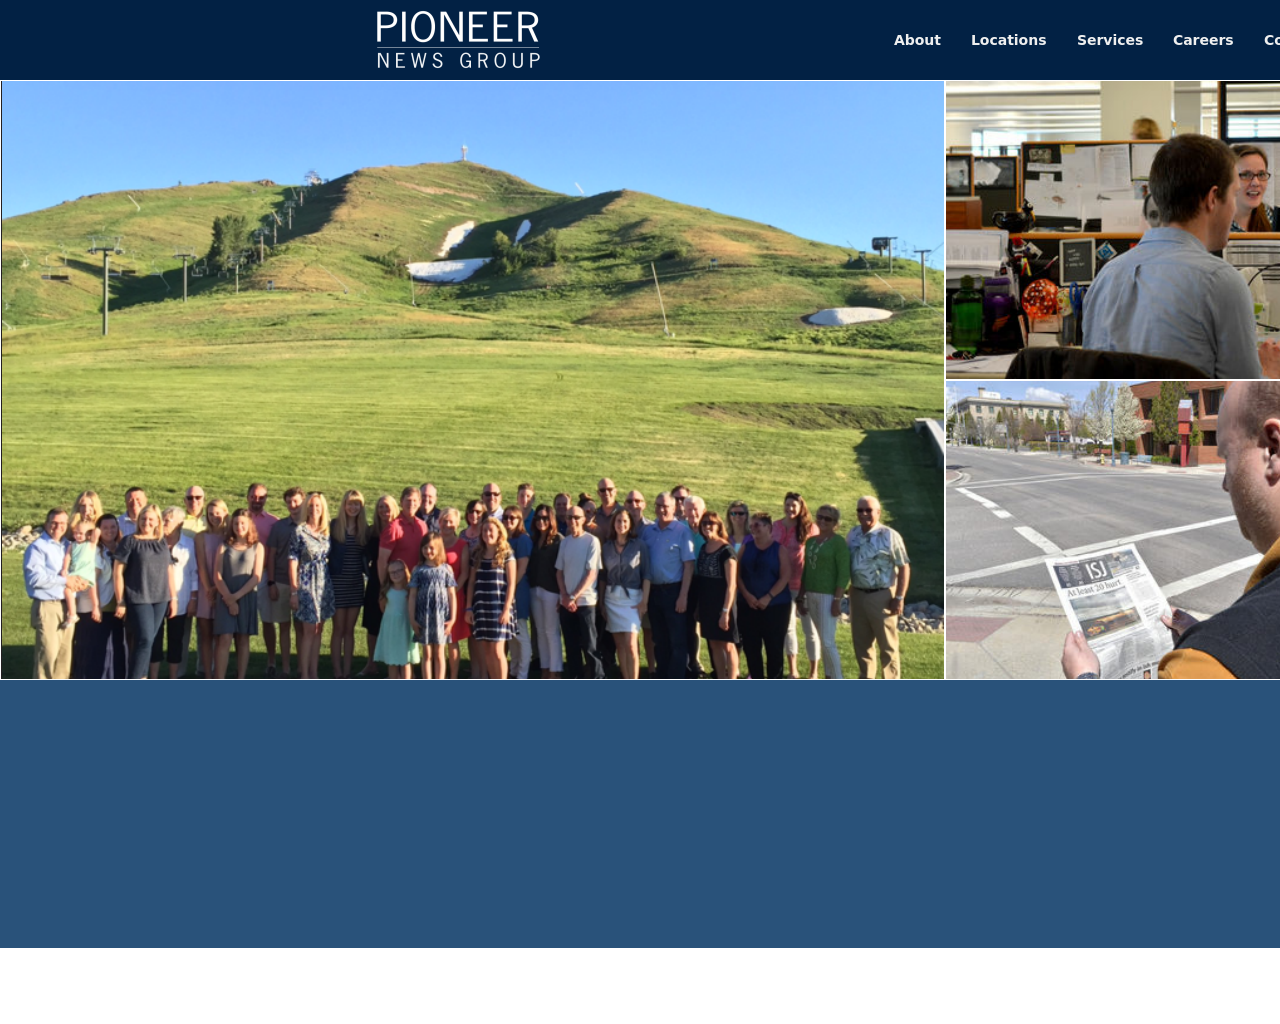 Pioneer-News-Group-Advertising-Reviews-Pricing